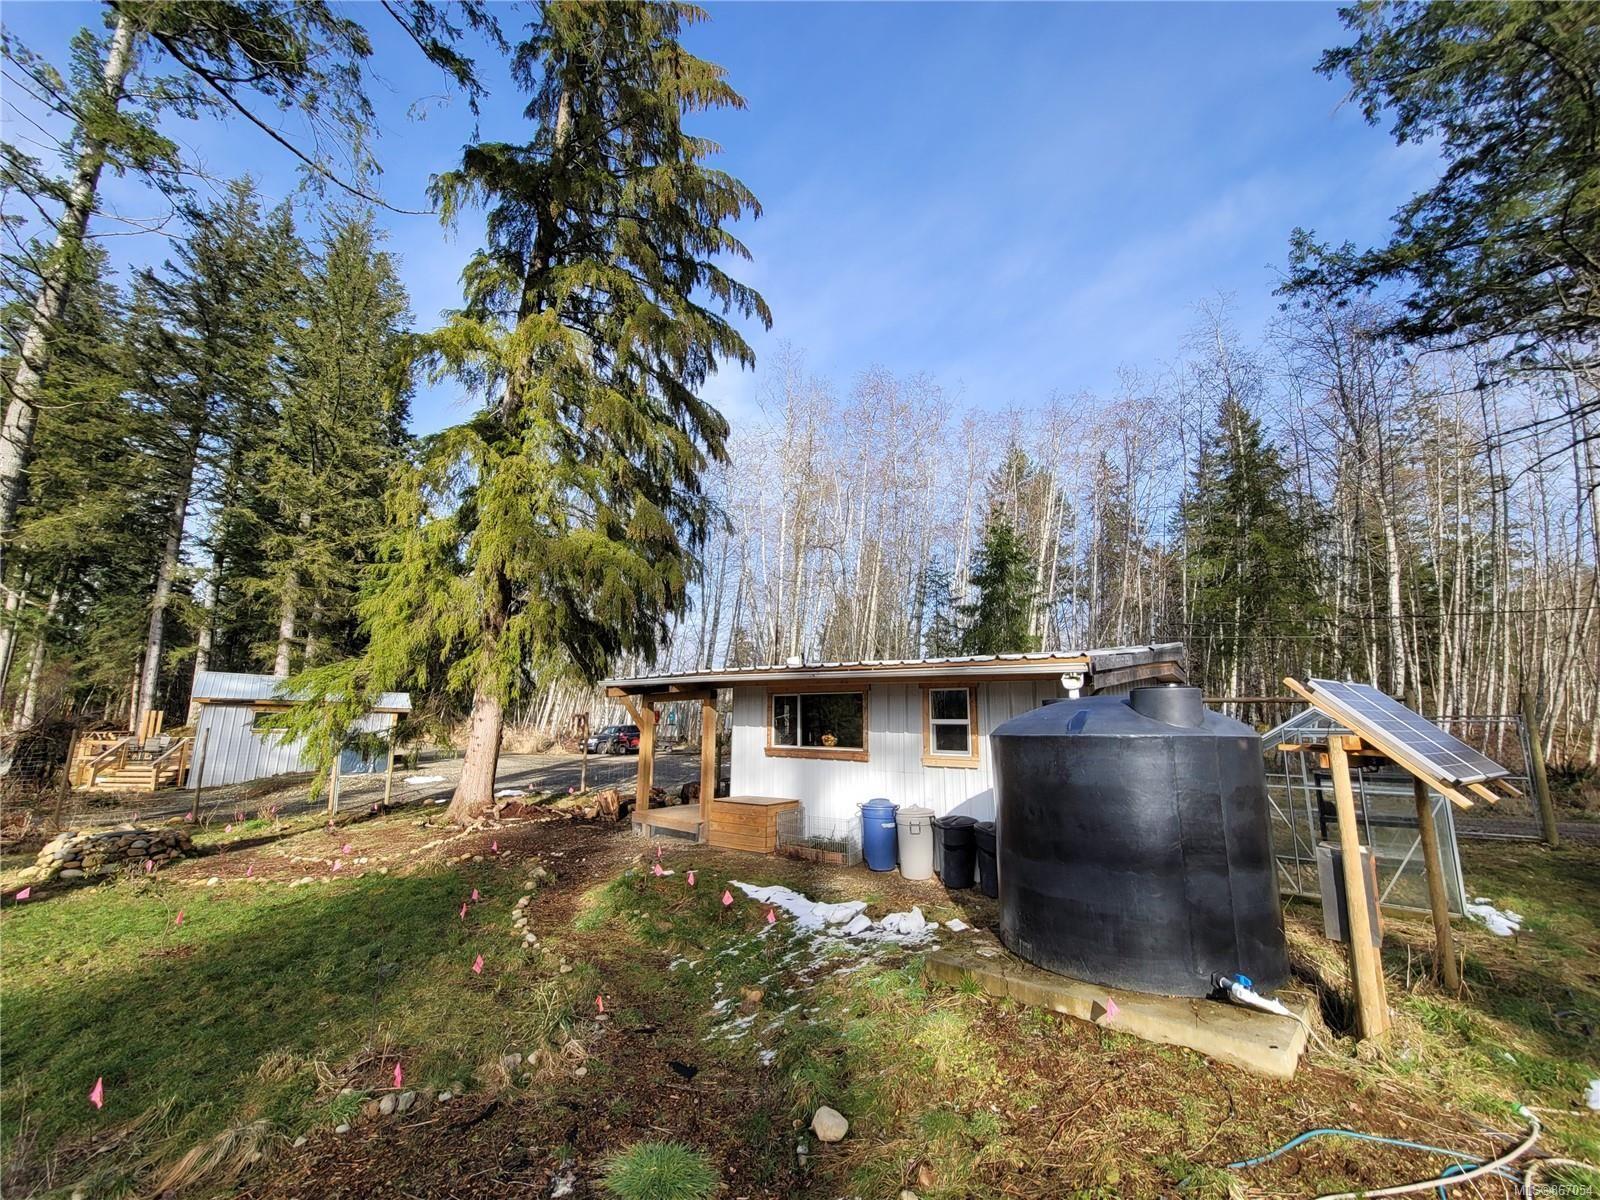 Photo 27: Photos: 2056 Spike Rd in : CV Merville Black Creek House for sale (Comox Valley)  : MLS®# 867054